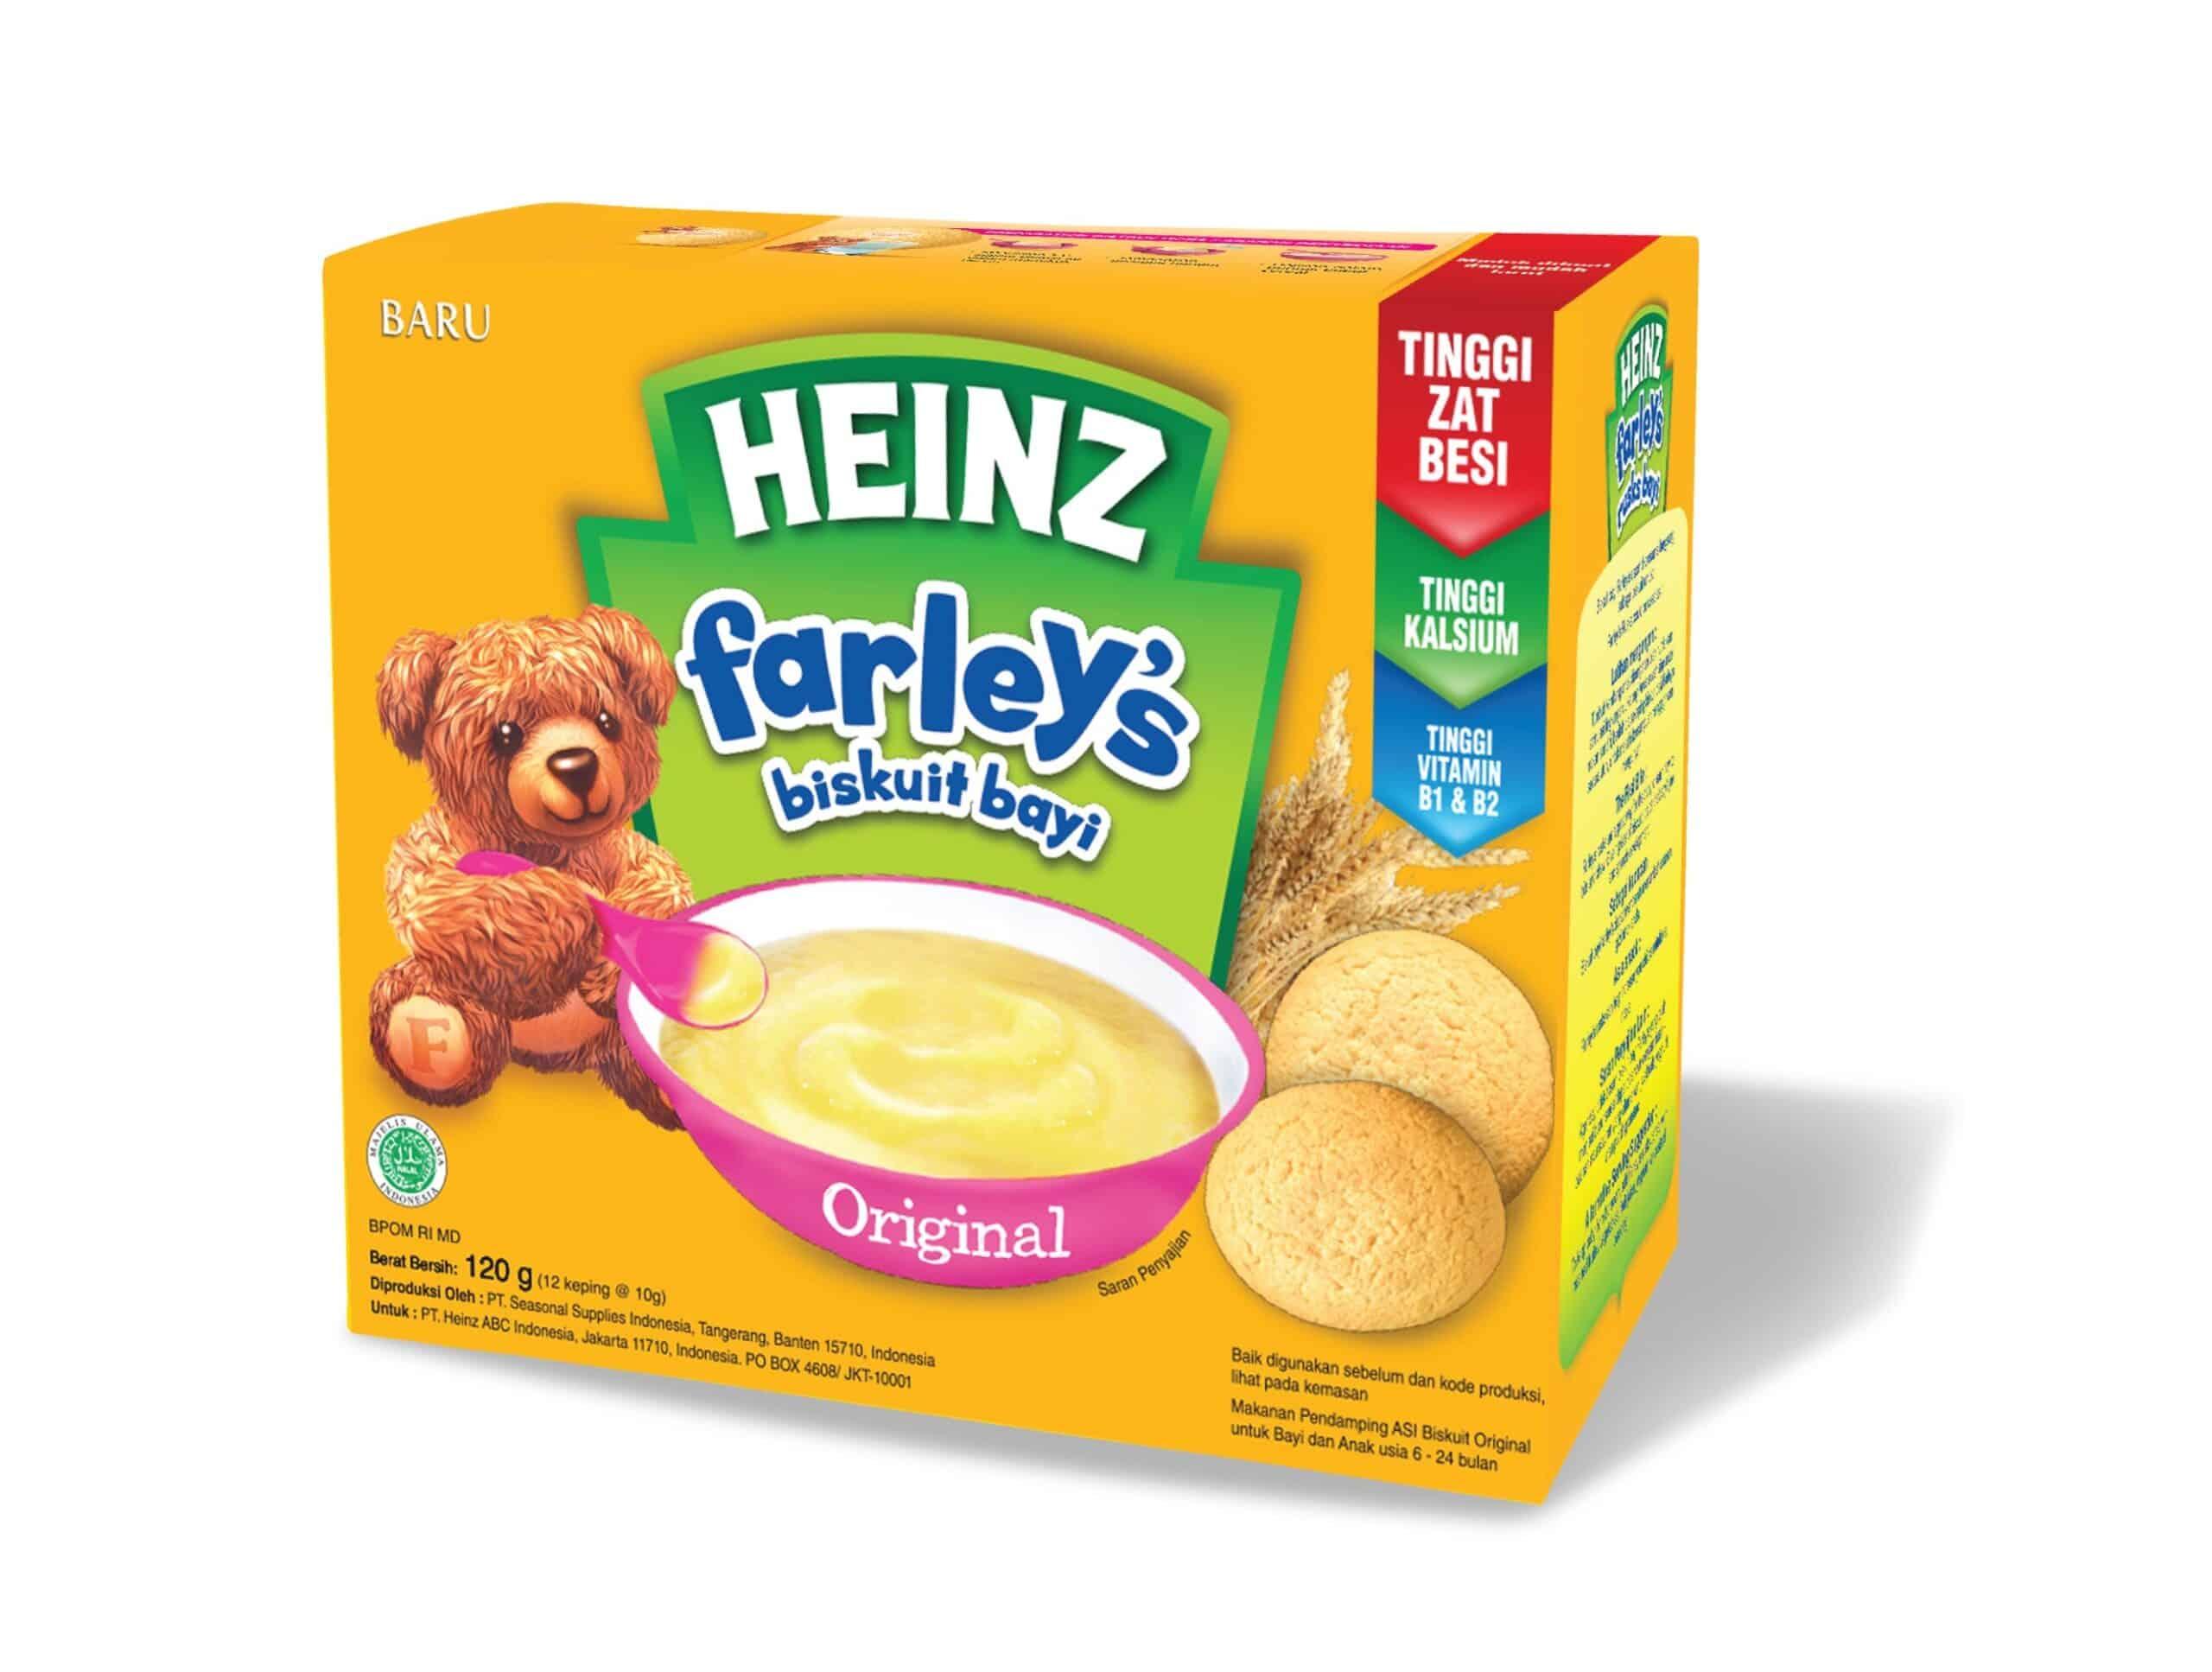 Heinz-Farleys